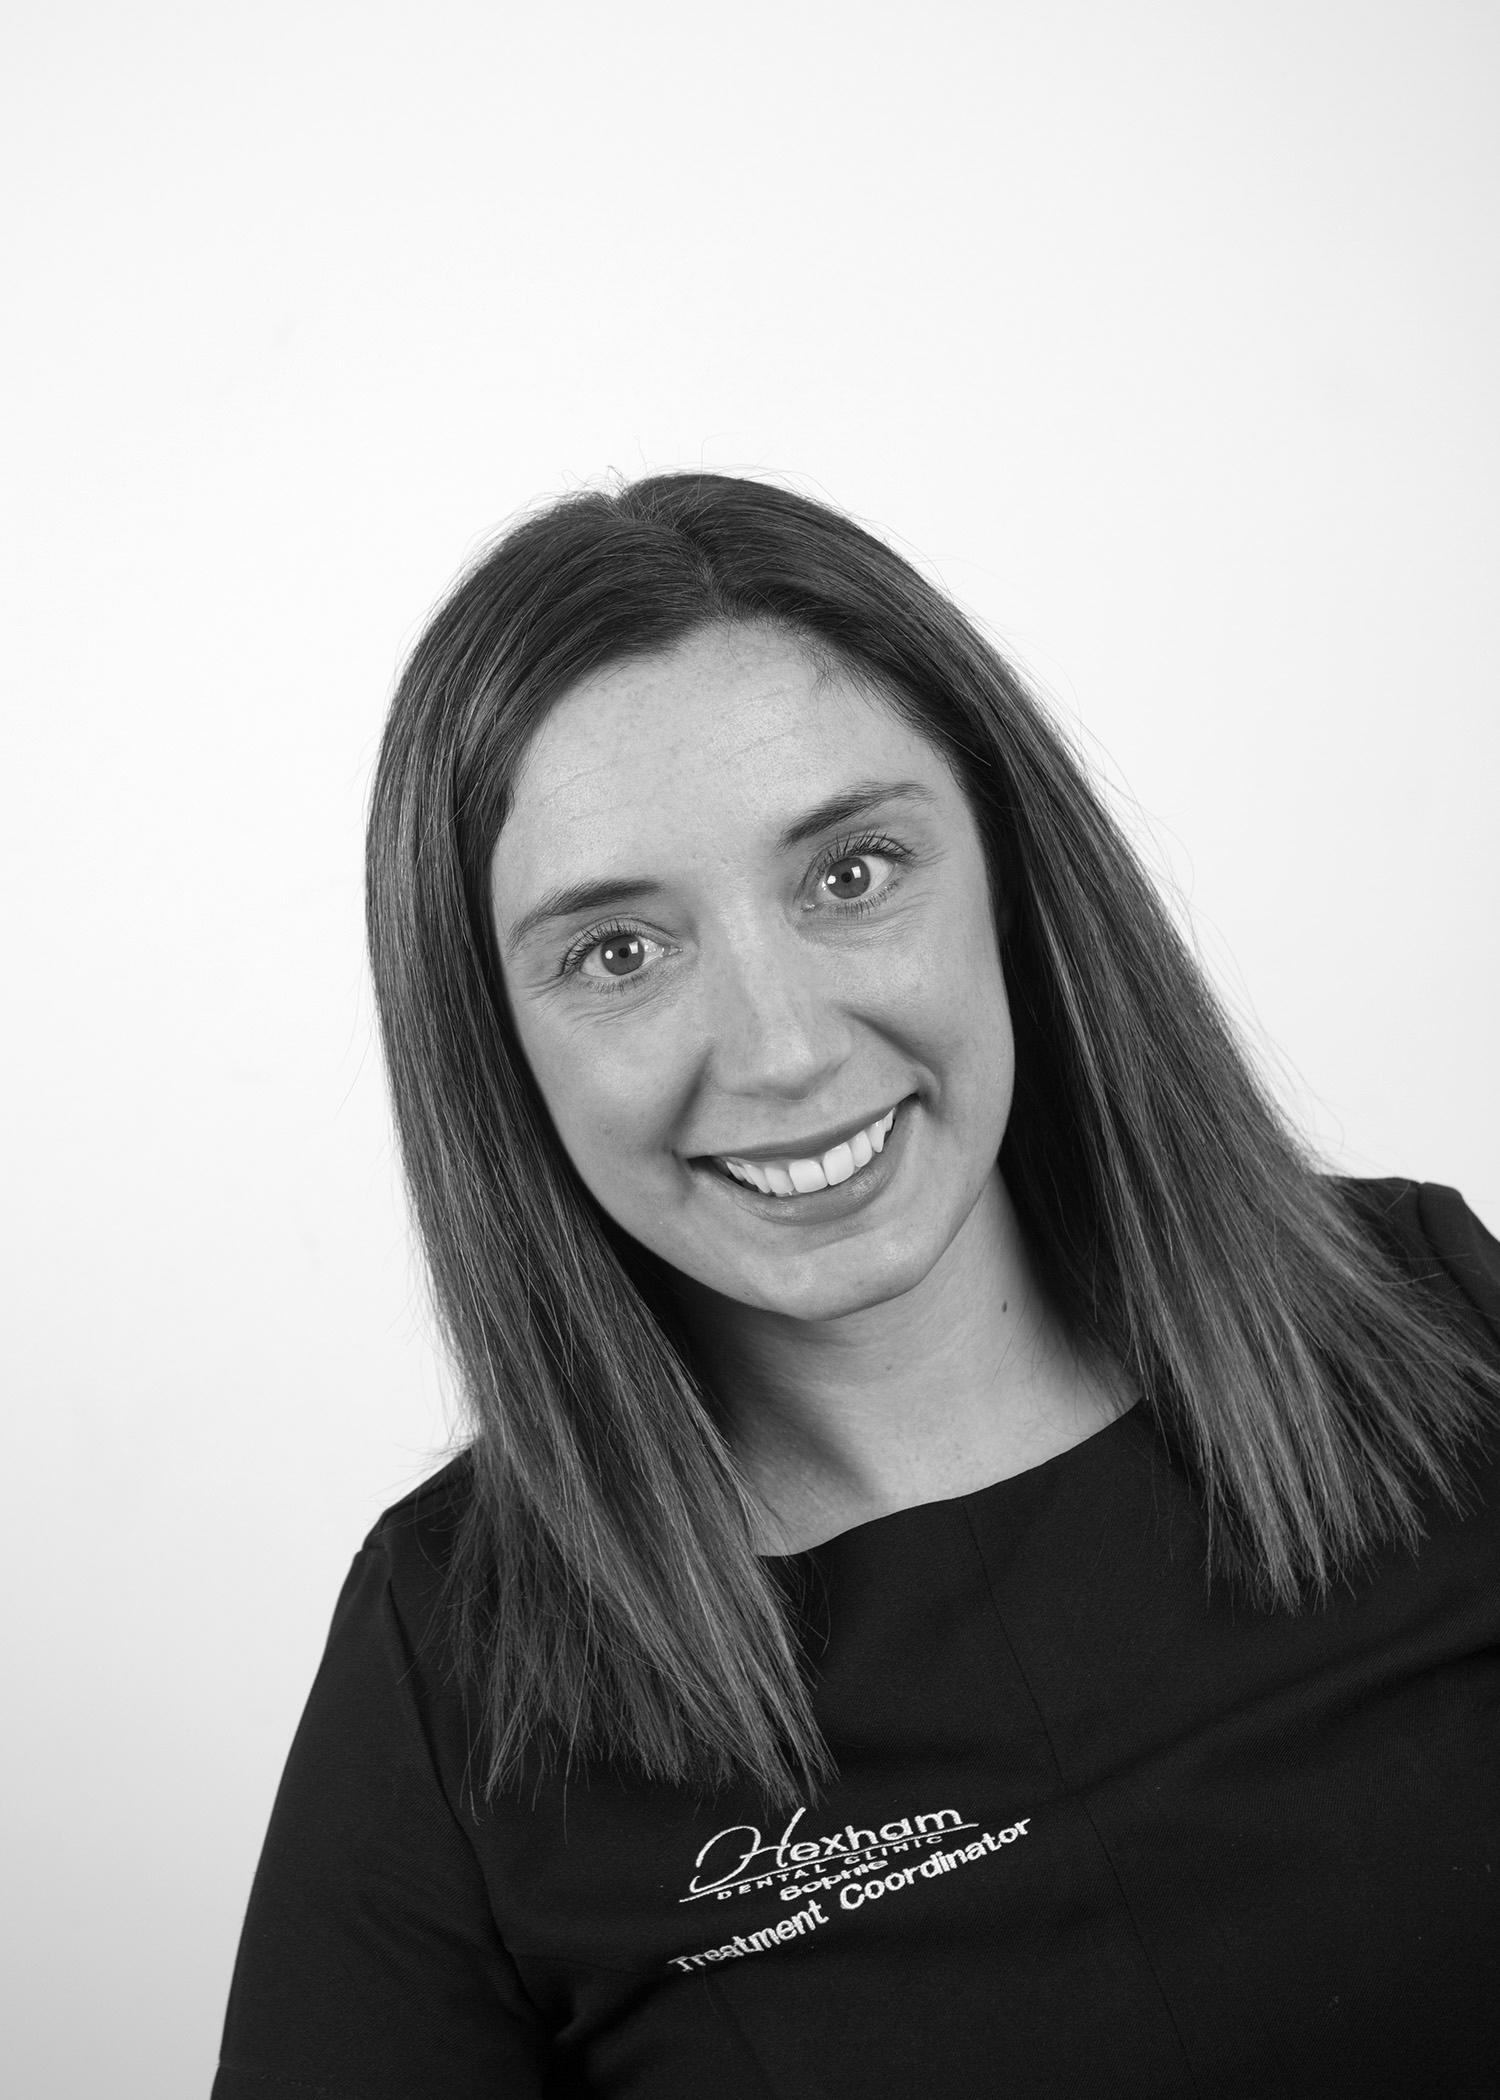 Sophie Davidson